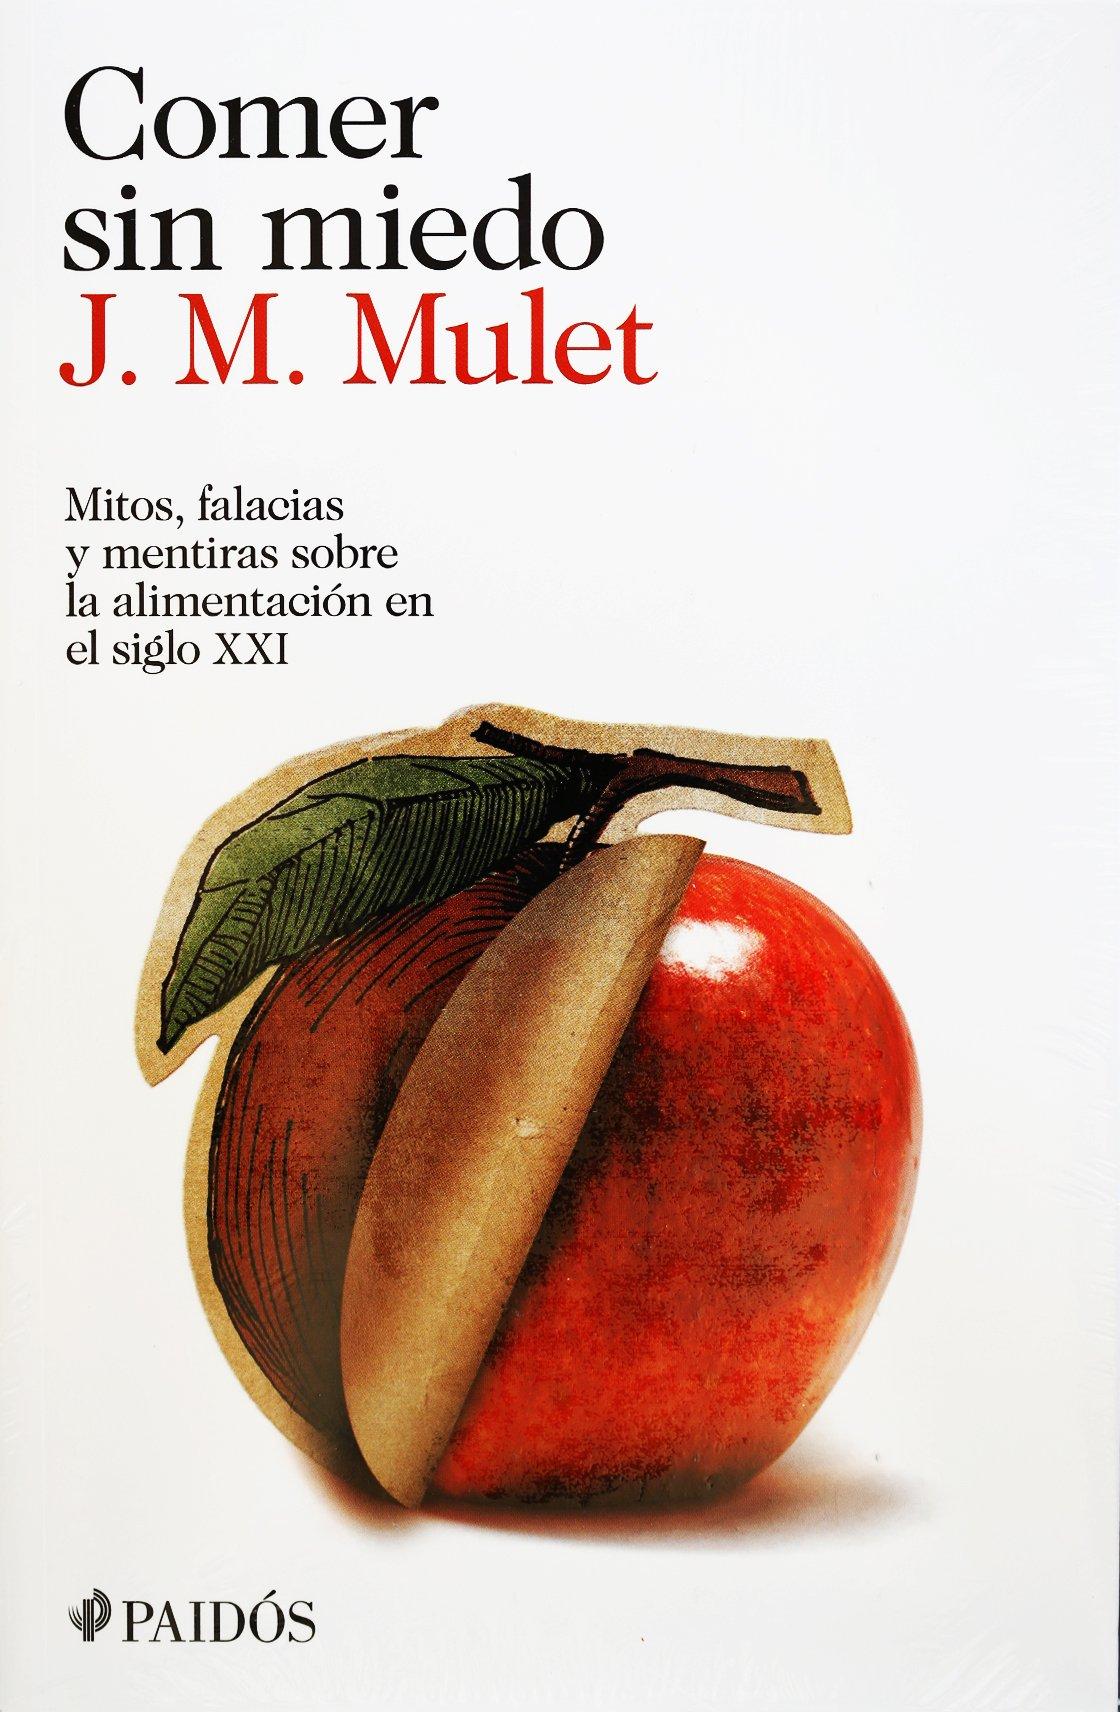 Comer sin miedo (Spanish Edition): J.M. Mulet: 9786079377182 ...